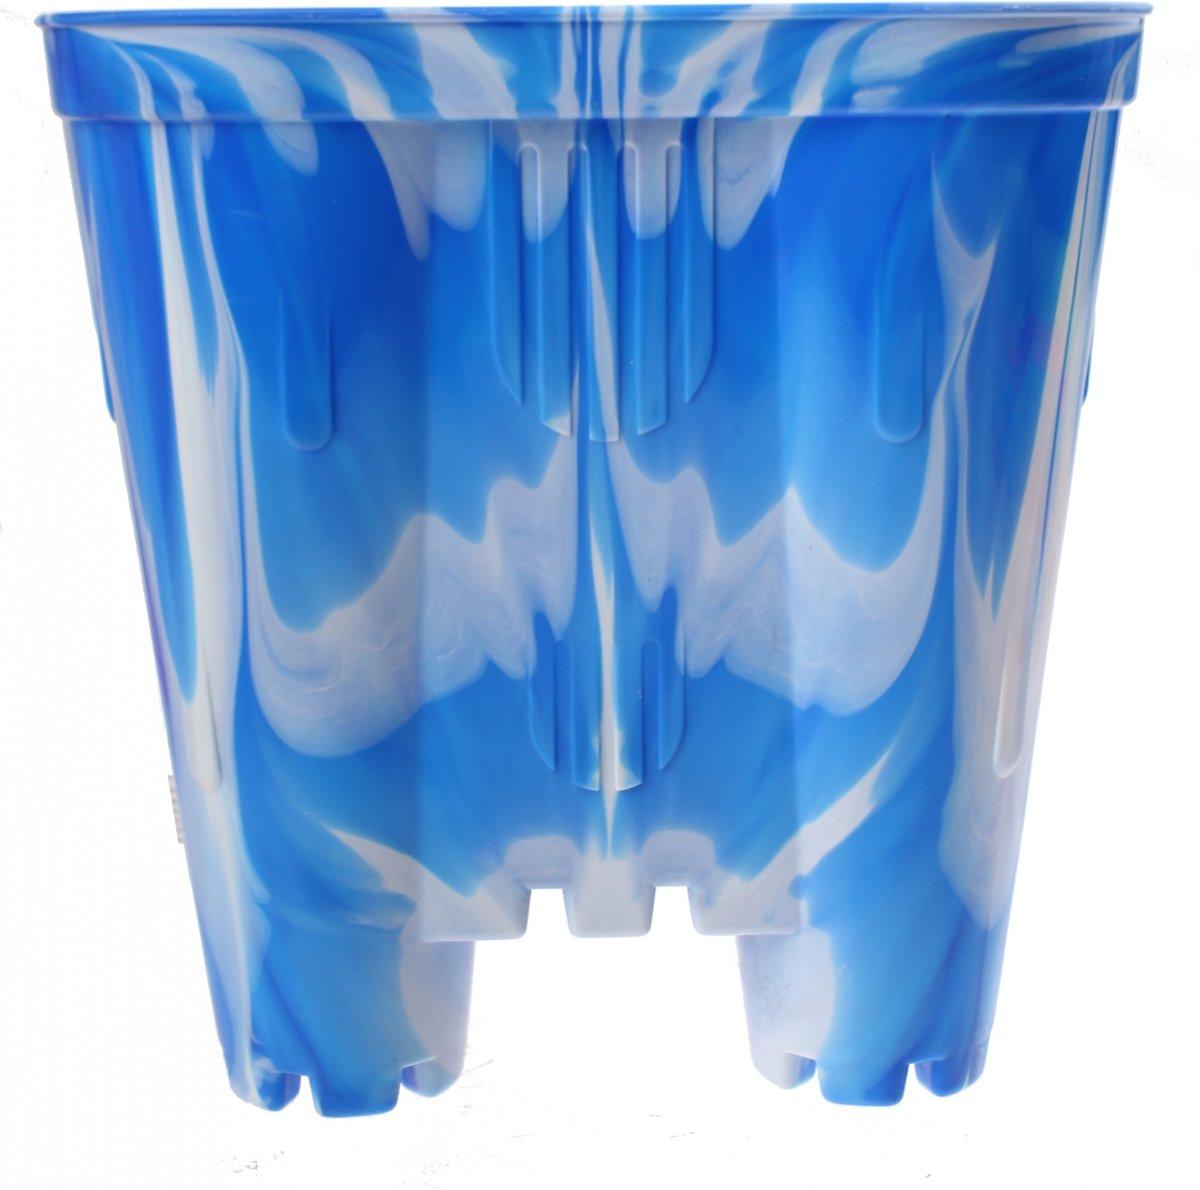 Yello Emmer Zandkasteel Blauw 13 X 16 Cm kopen